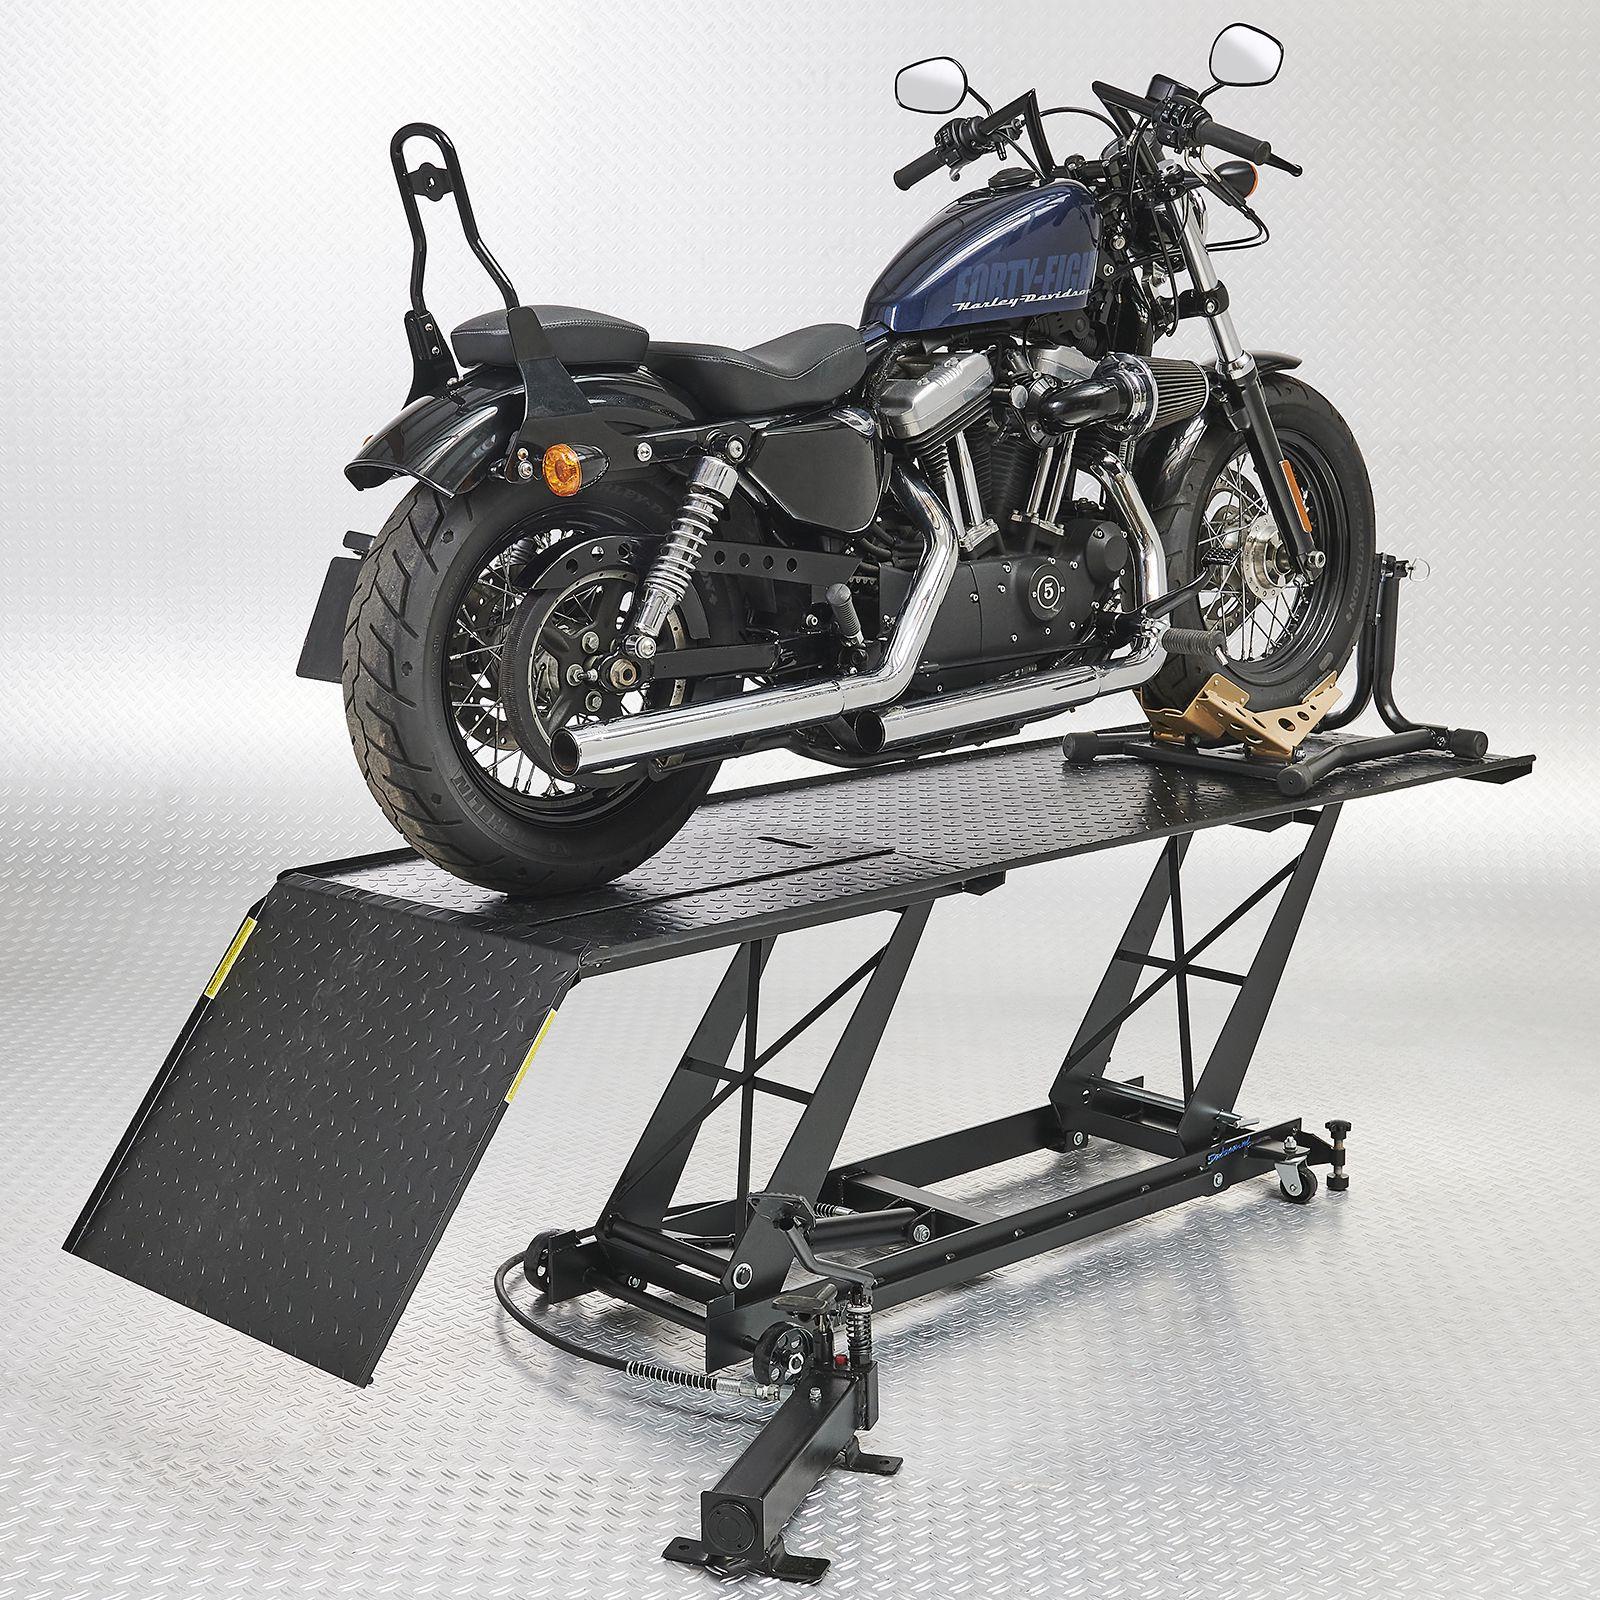 Harley Davidson op sterke motorheftafel met rijklem